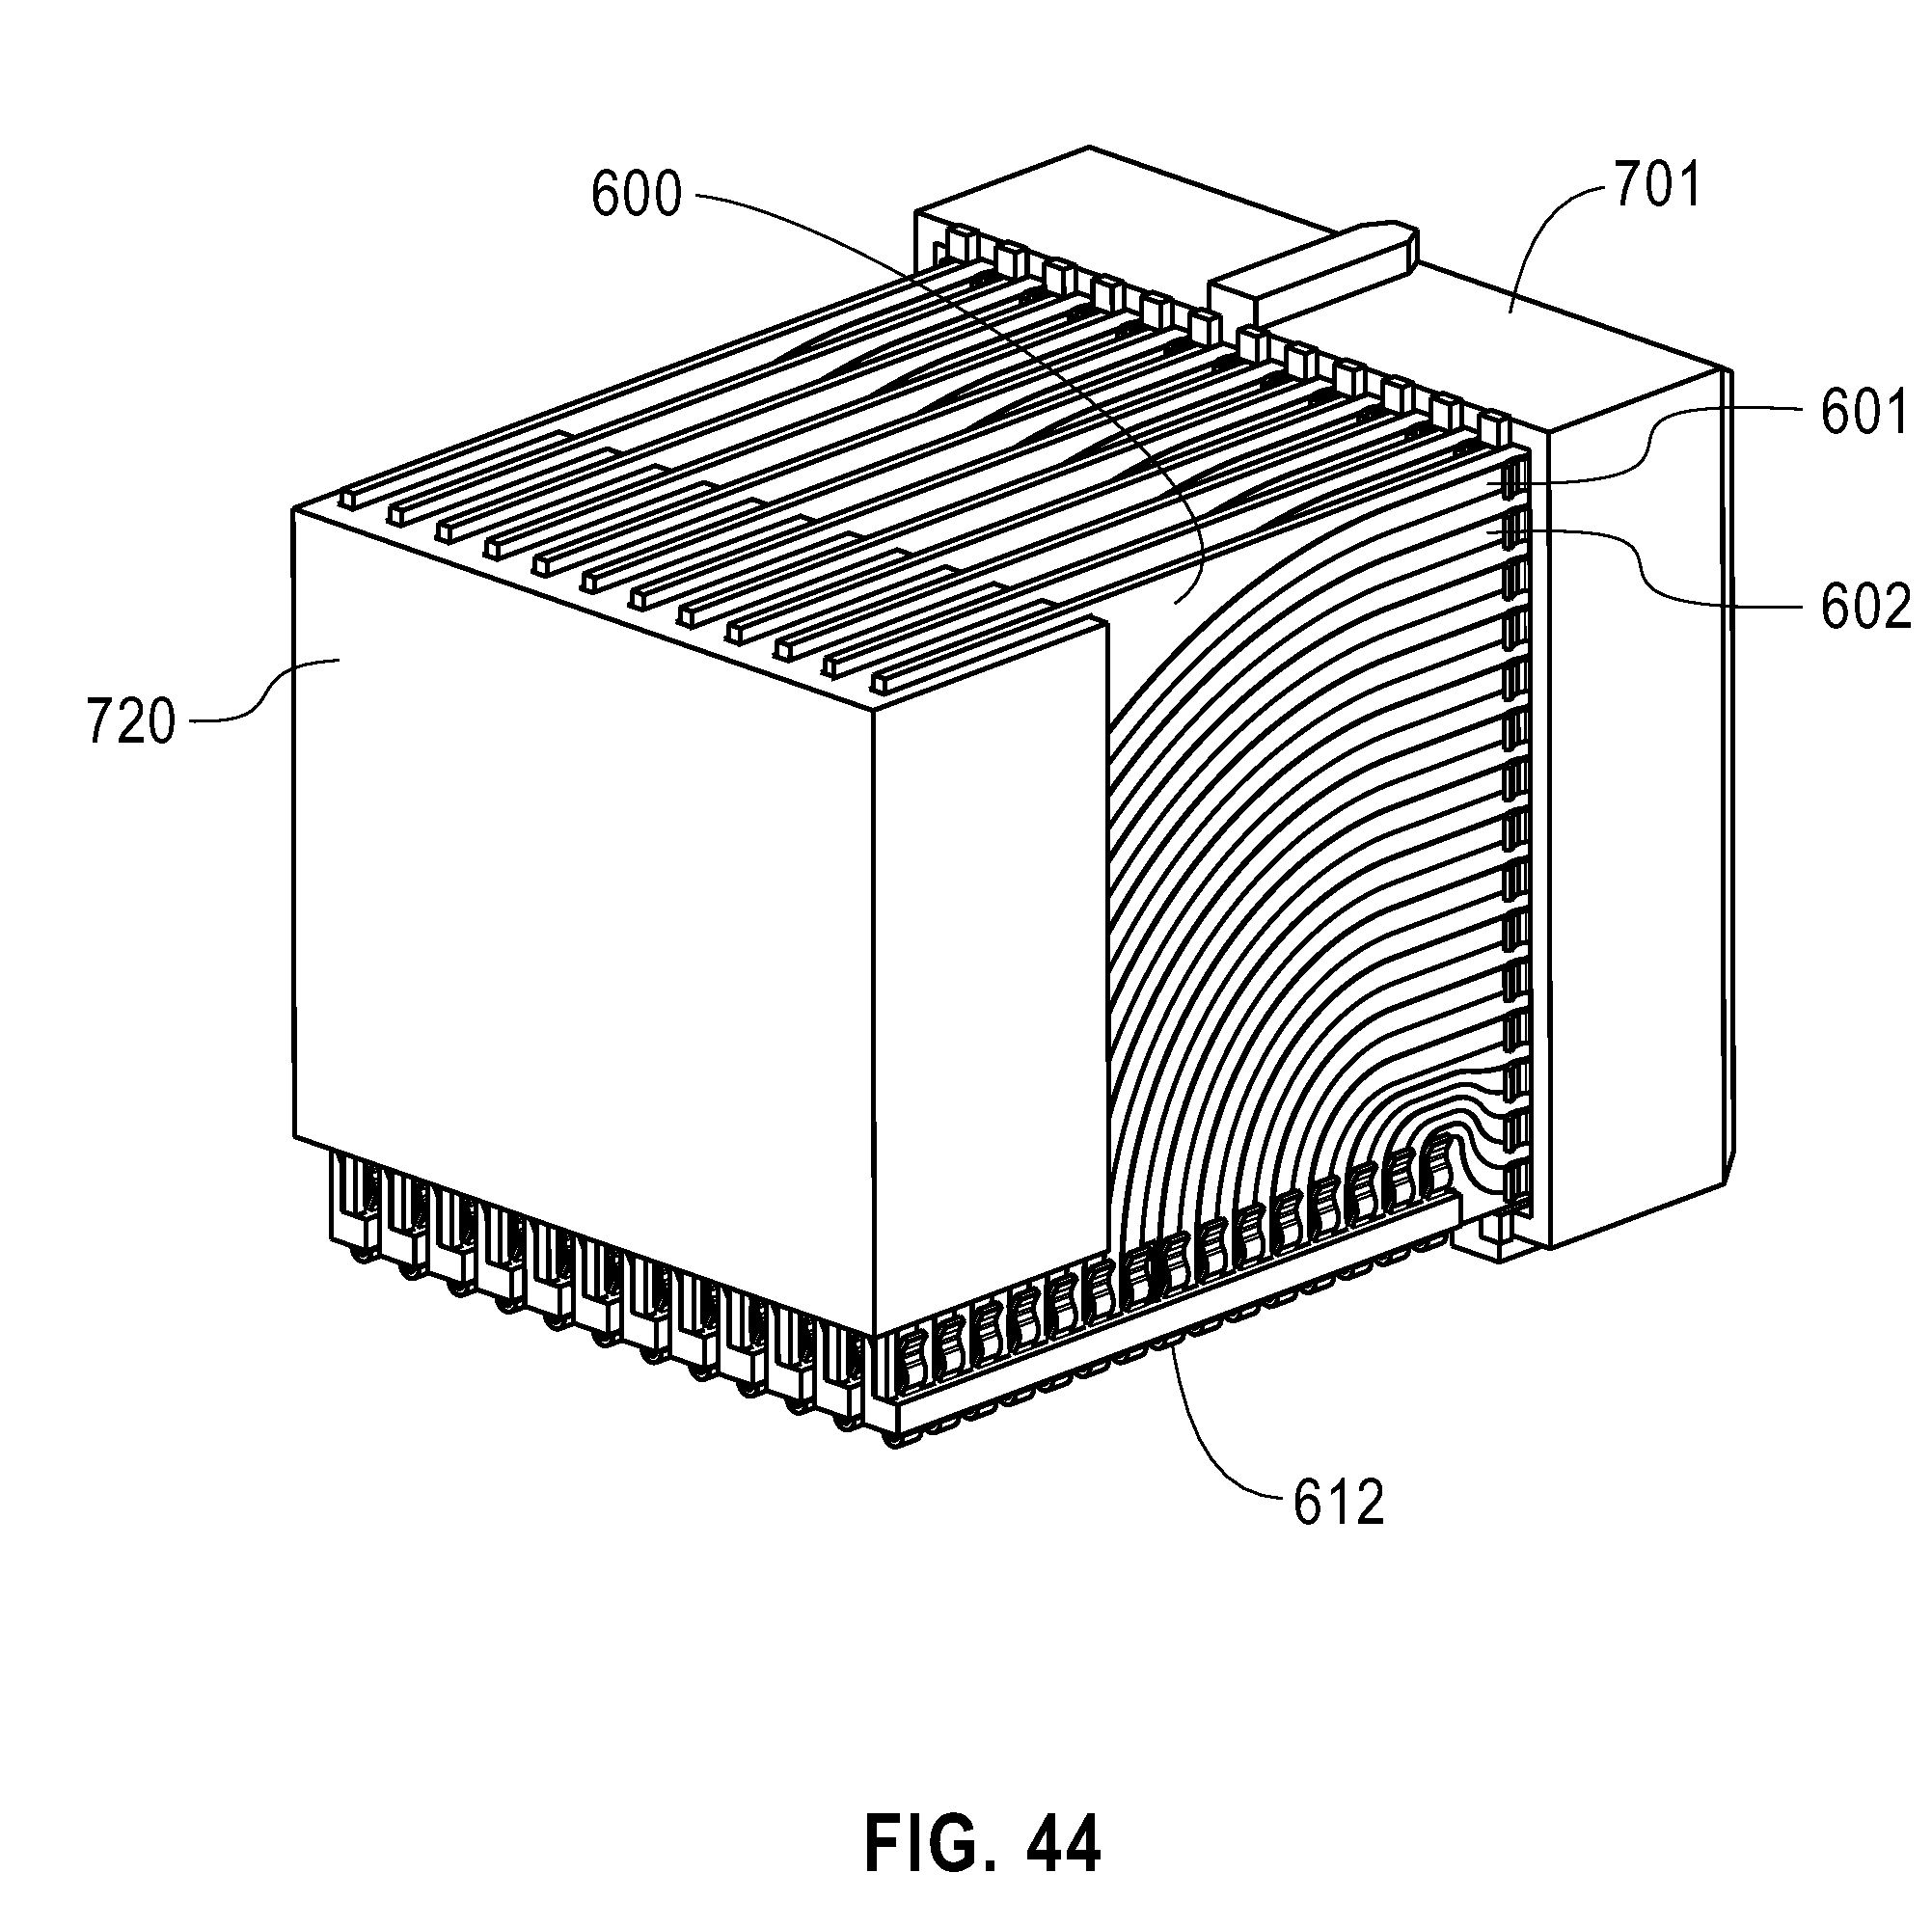 patent us20120178273 - tall mezzanine connector